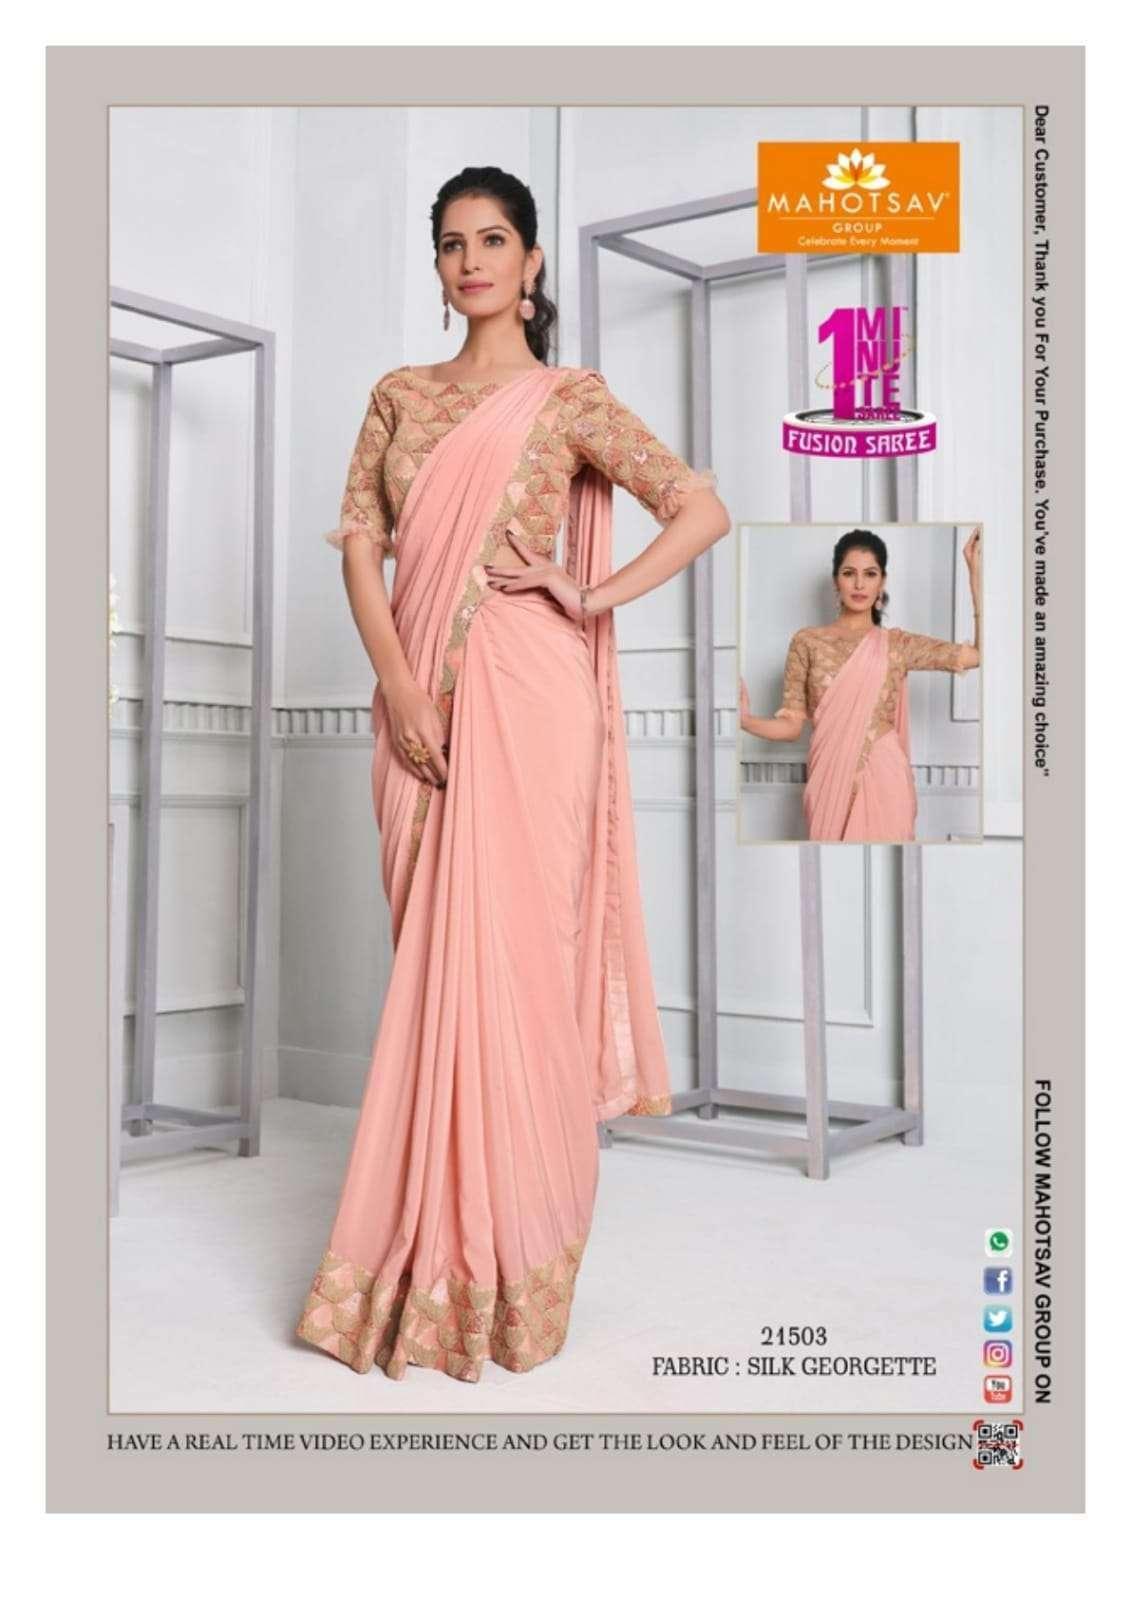 Mahotsav Moh Manthan Izzara 21501 To 215018 Series Fancy Designer Sarees Collection 21503